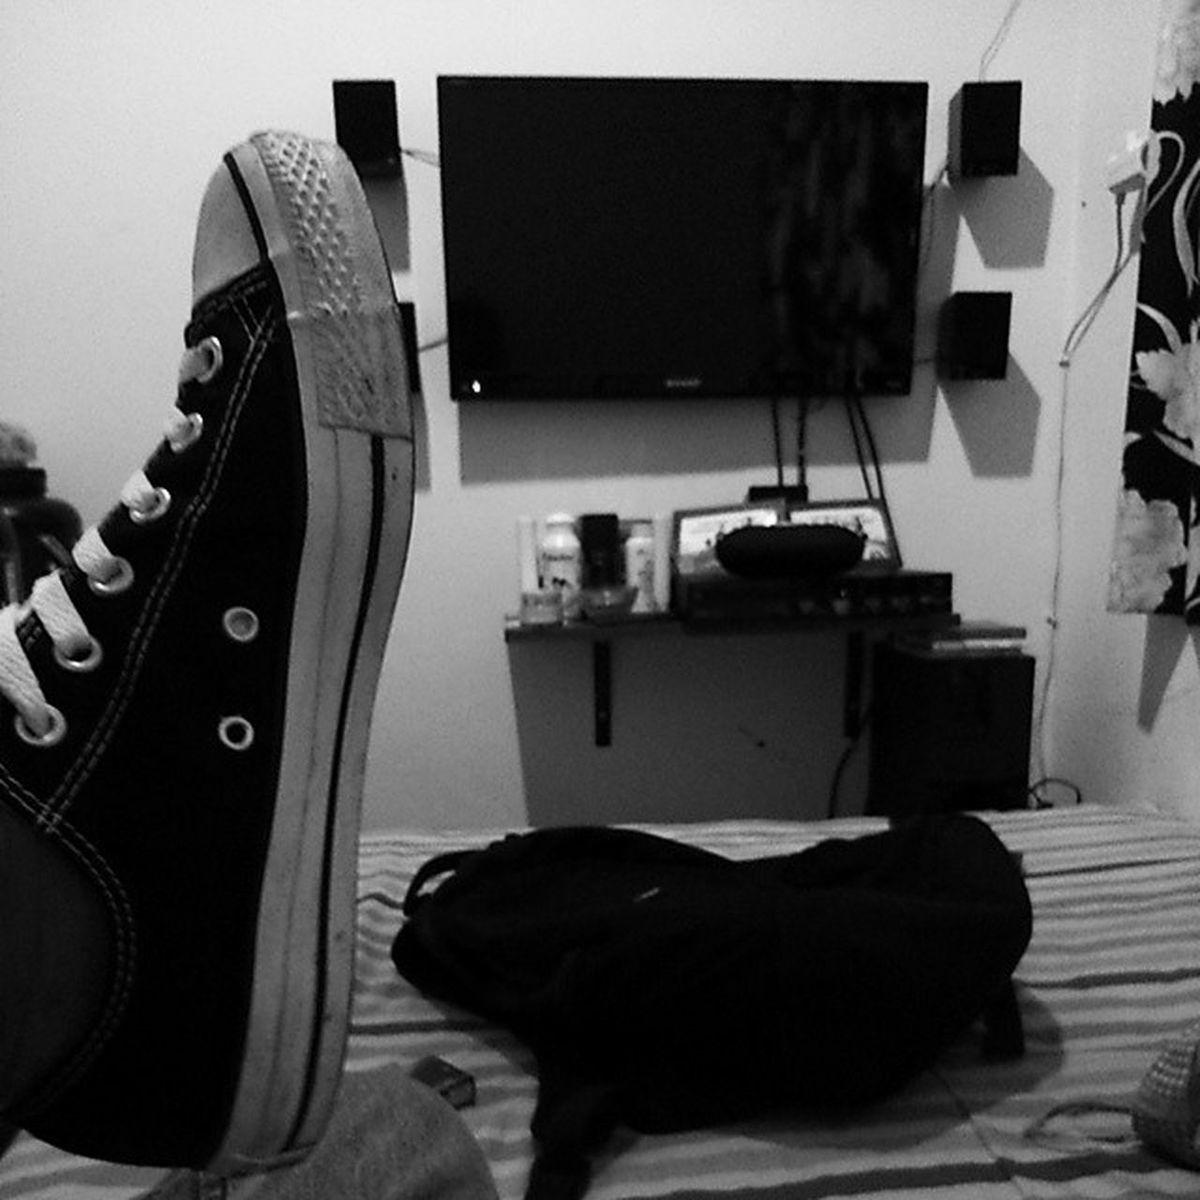 Blackandwhite Converse Shoespotrait